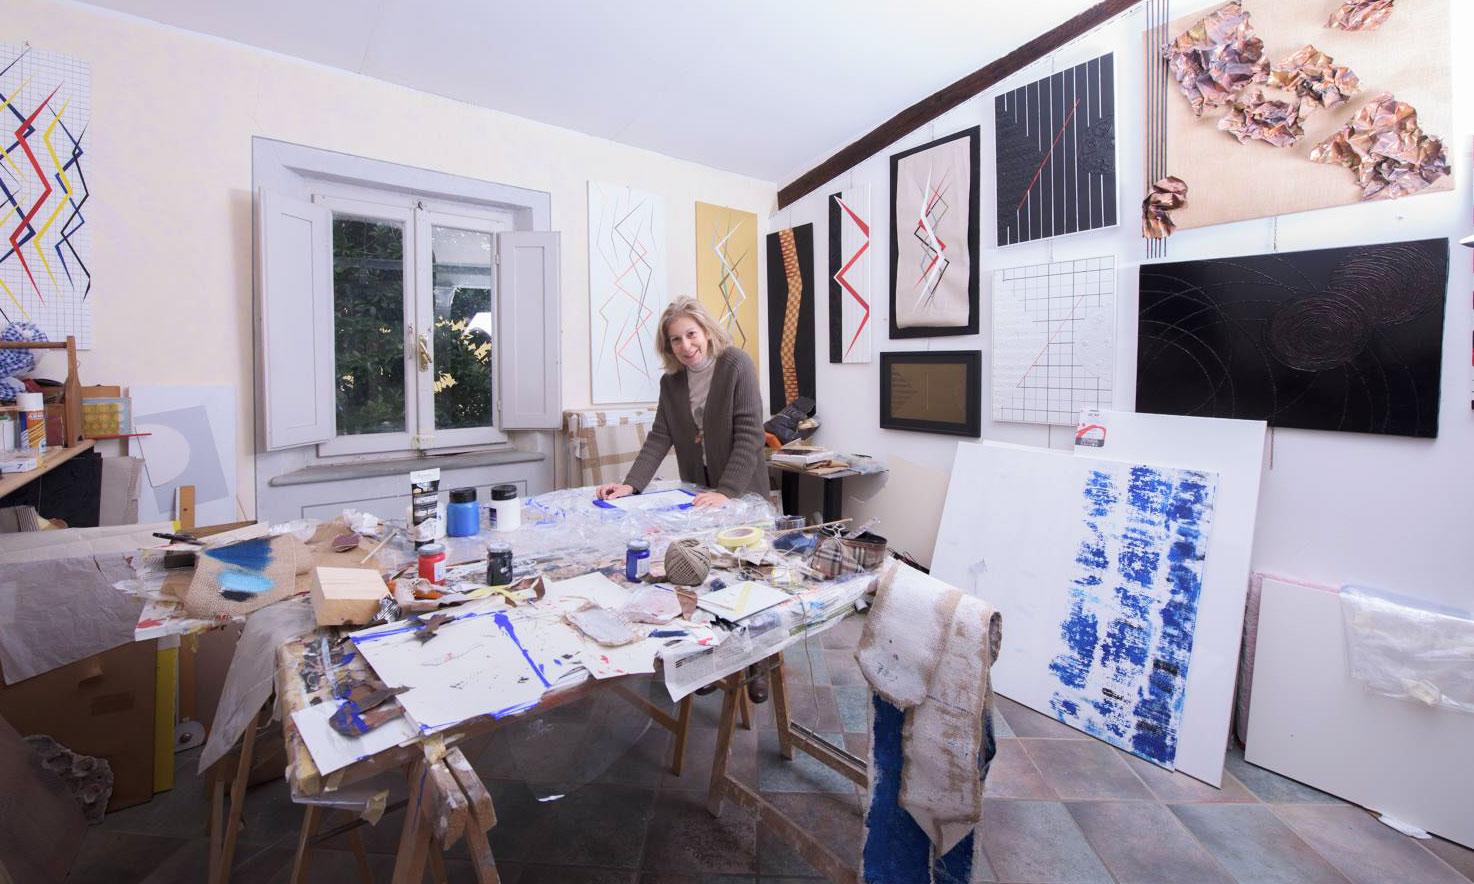 Silvia Percussi Artista